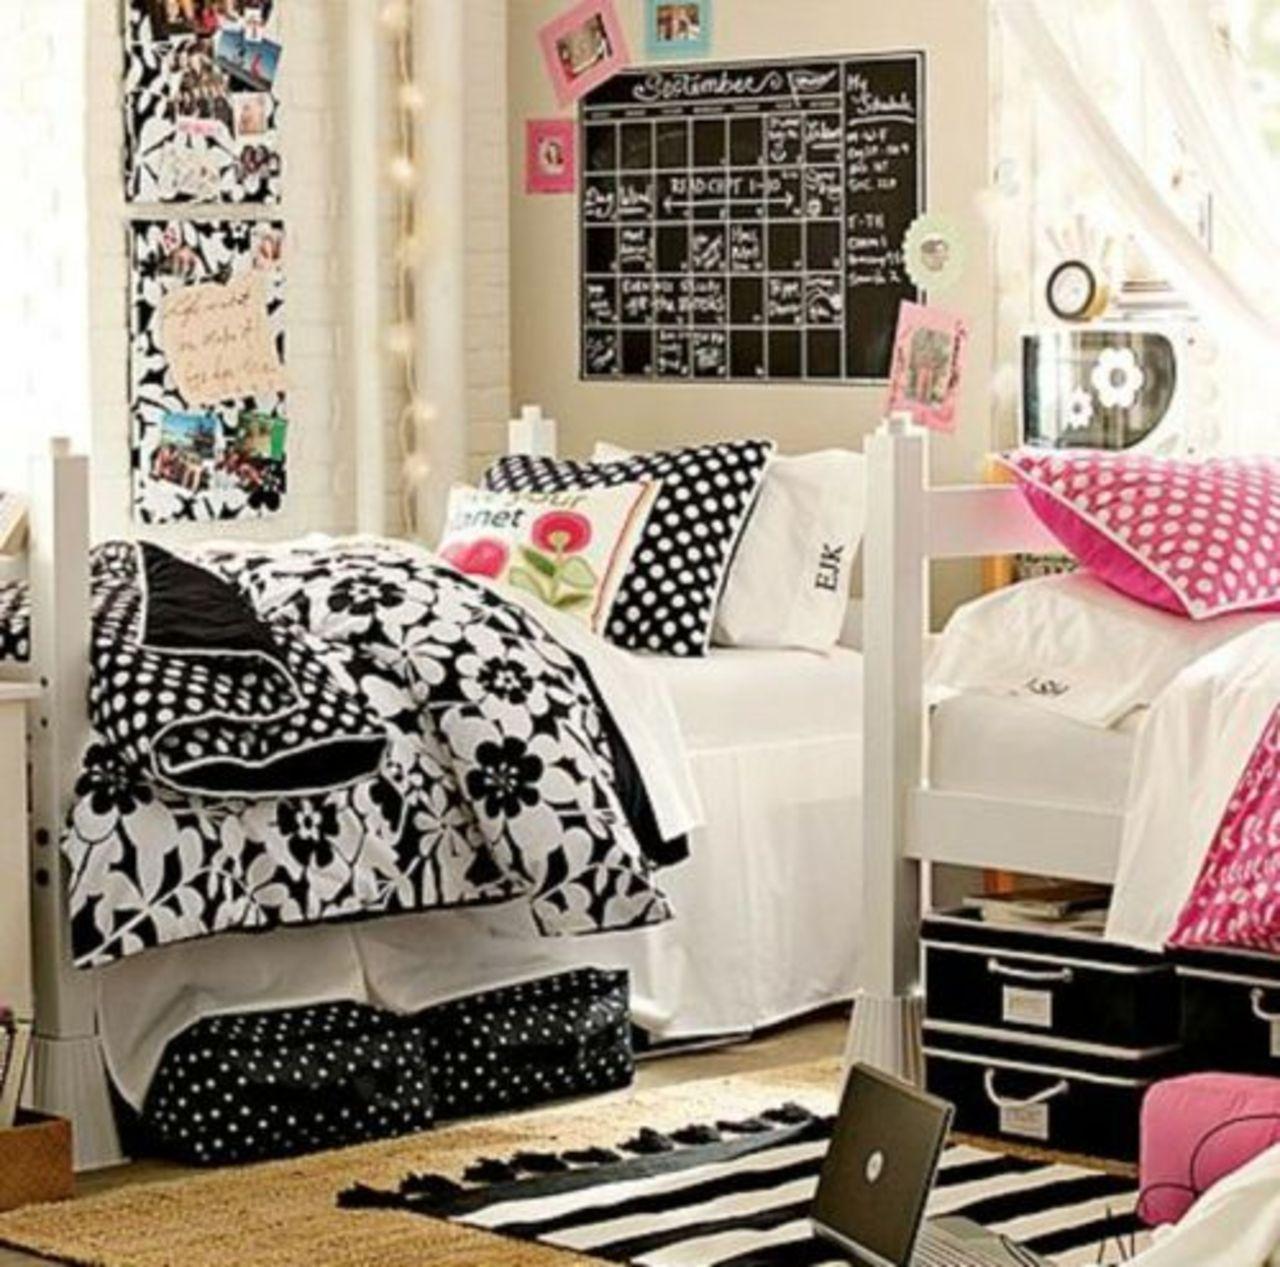 Bookshelf Decorating Ideas Bts